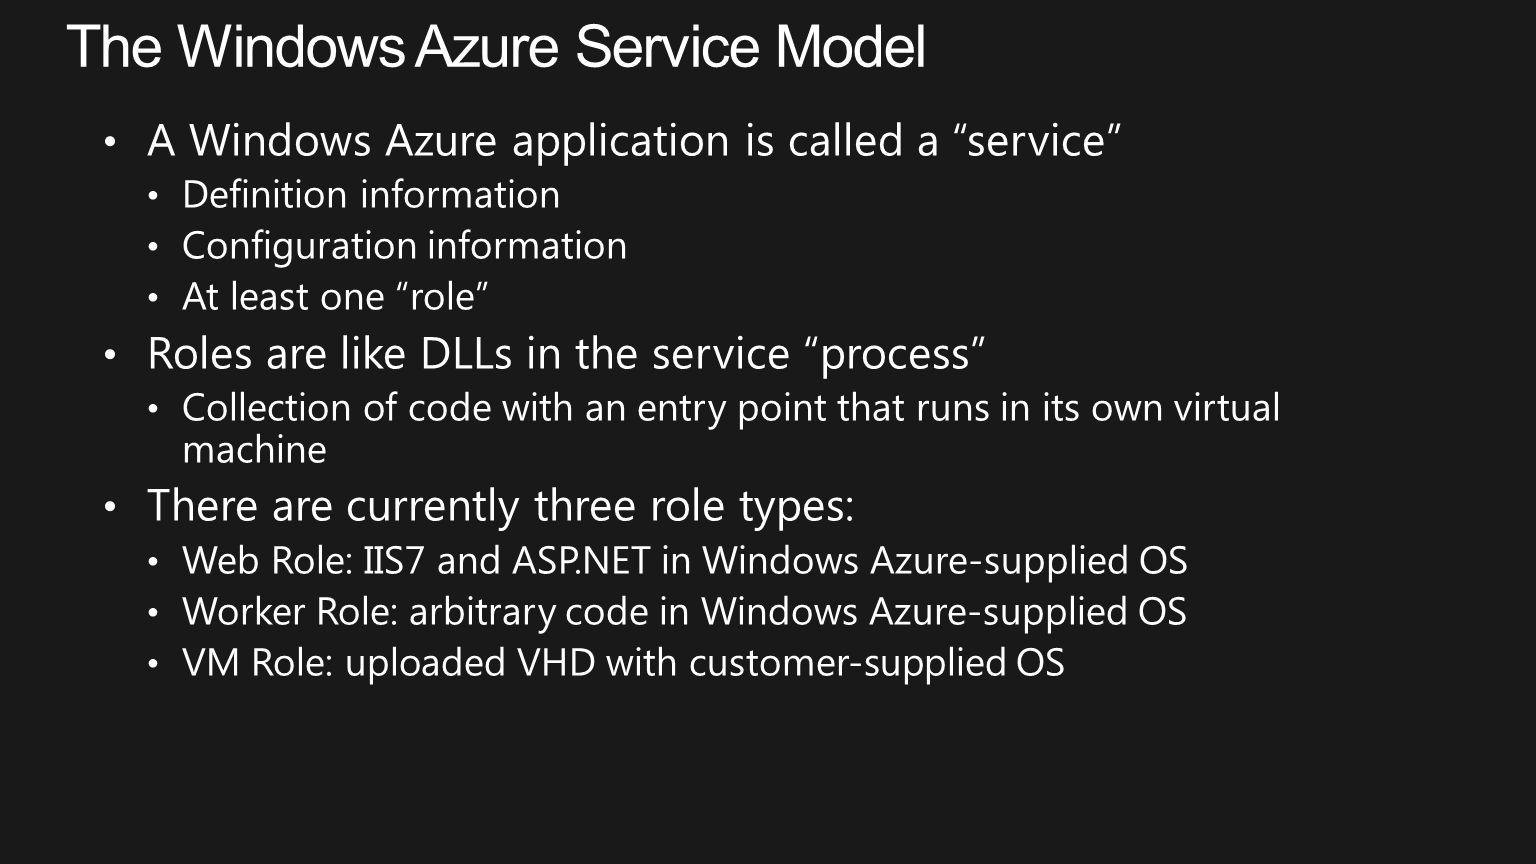 The Windows Azure Service Model